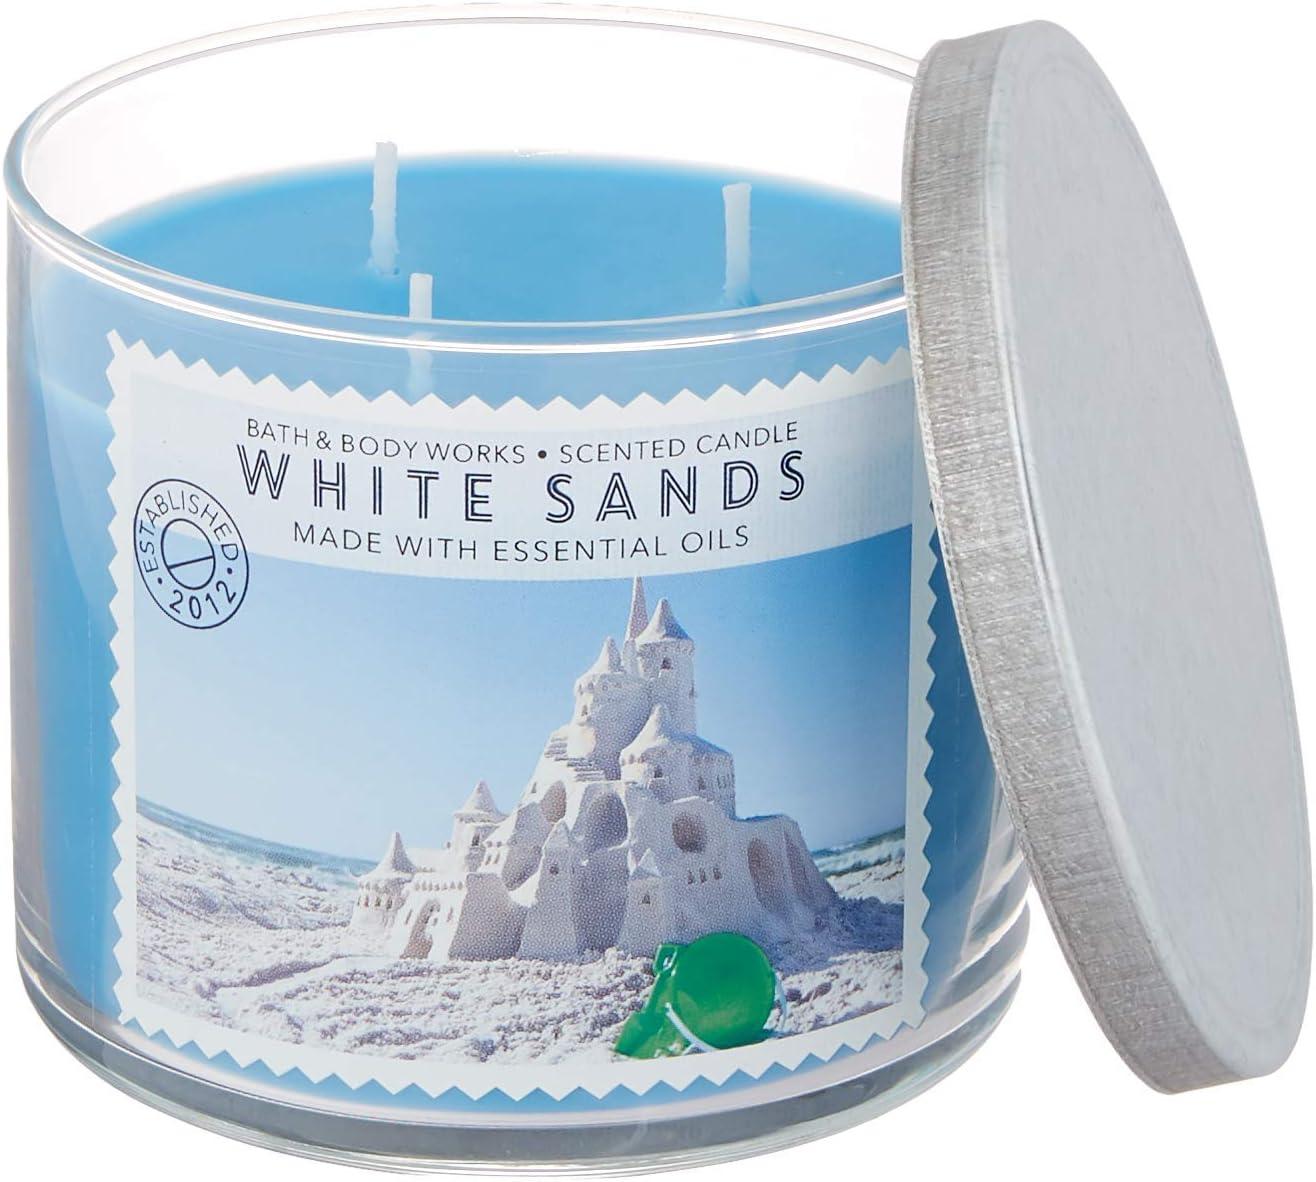 Bath and 全国どこでも送料無料 国内在庫 Body Works White Barn Ou Wick Sands Candle 3 14.5